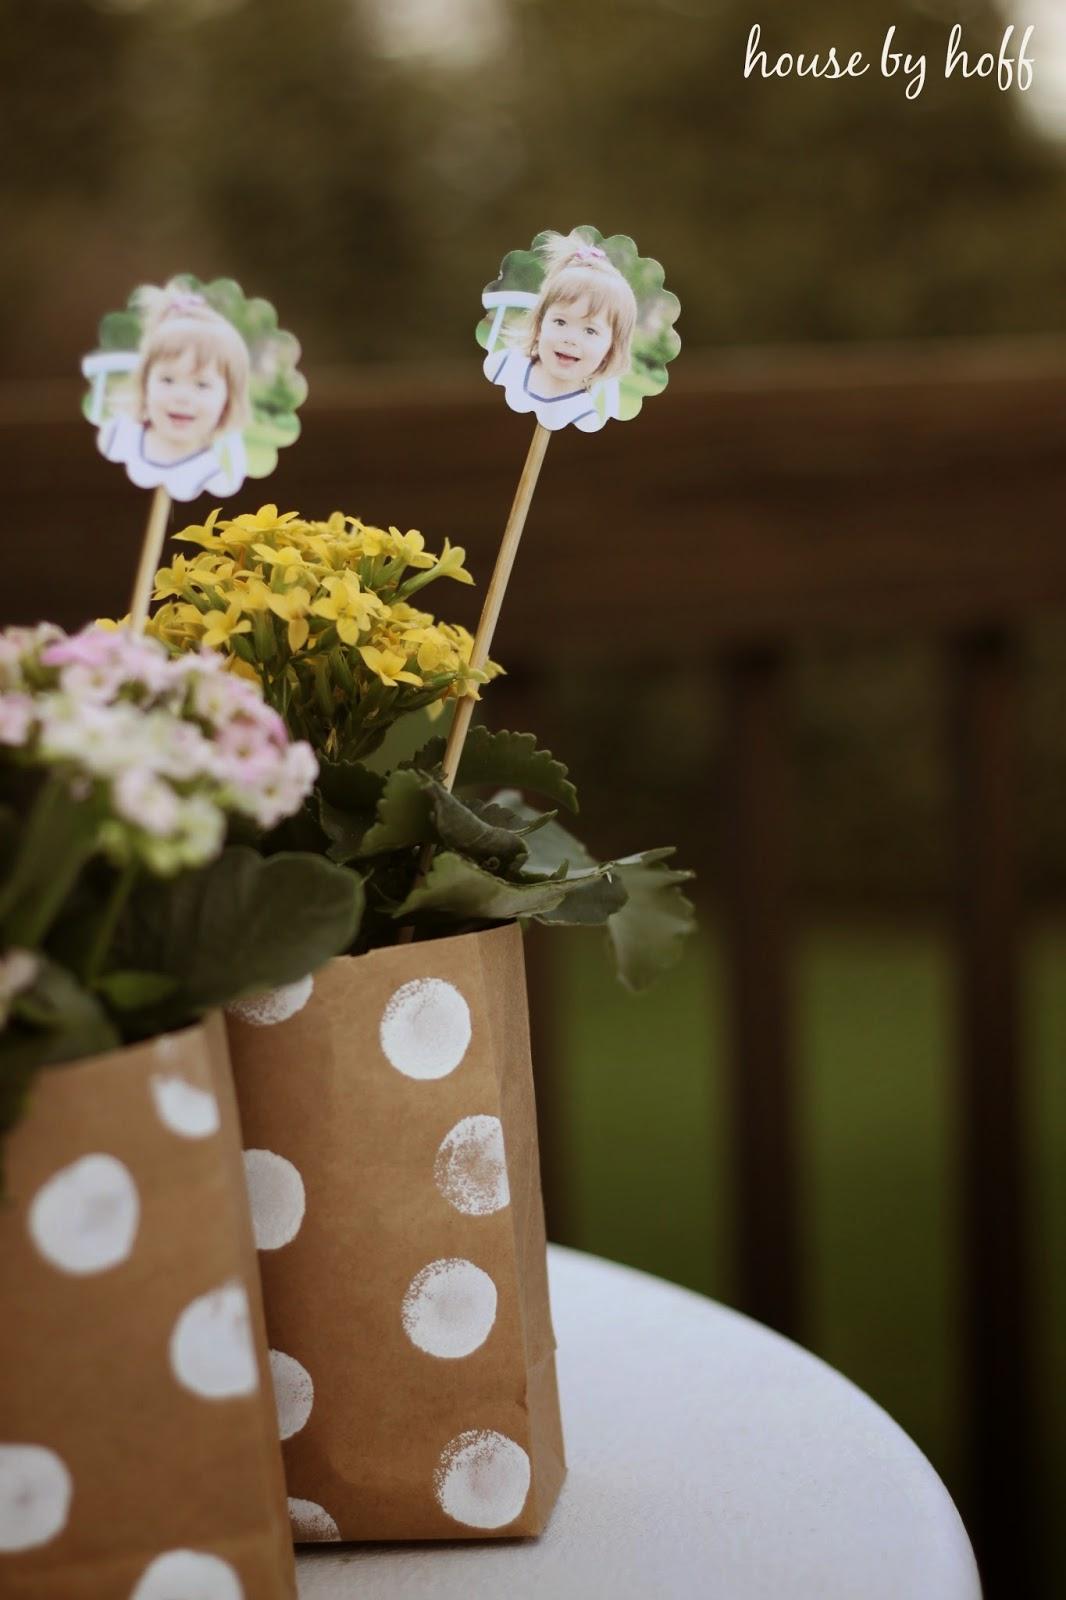 easy mother's day gift idea via housebyhoff.com